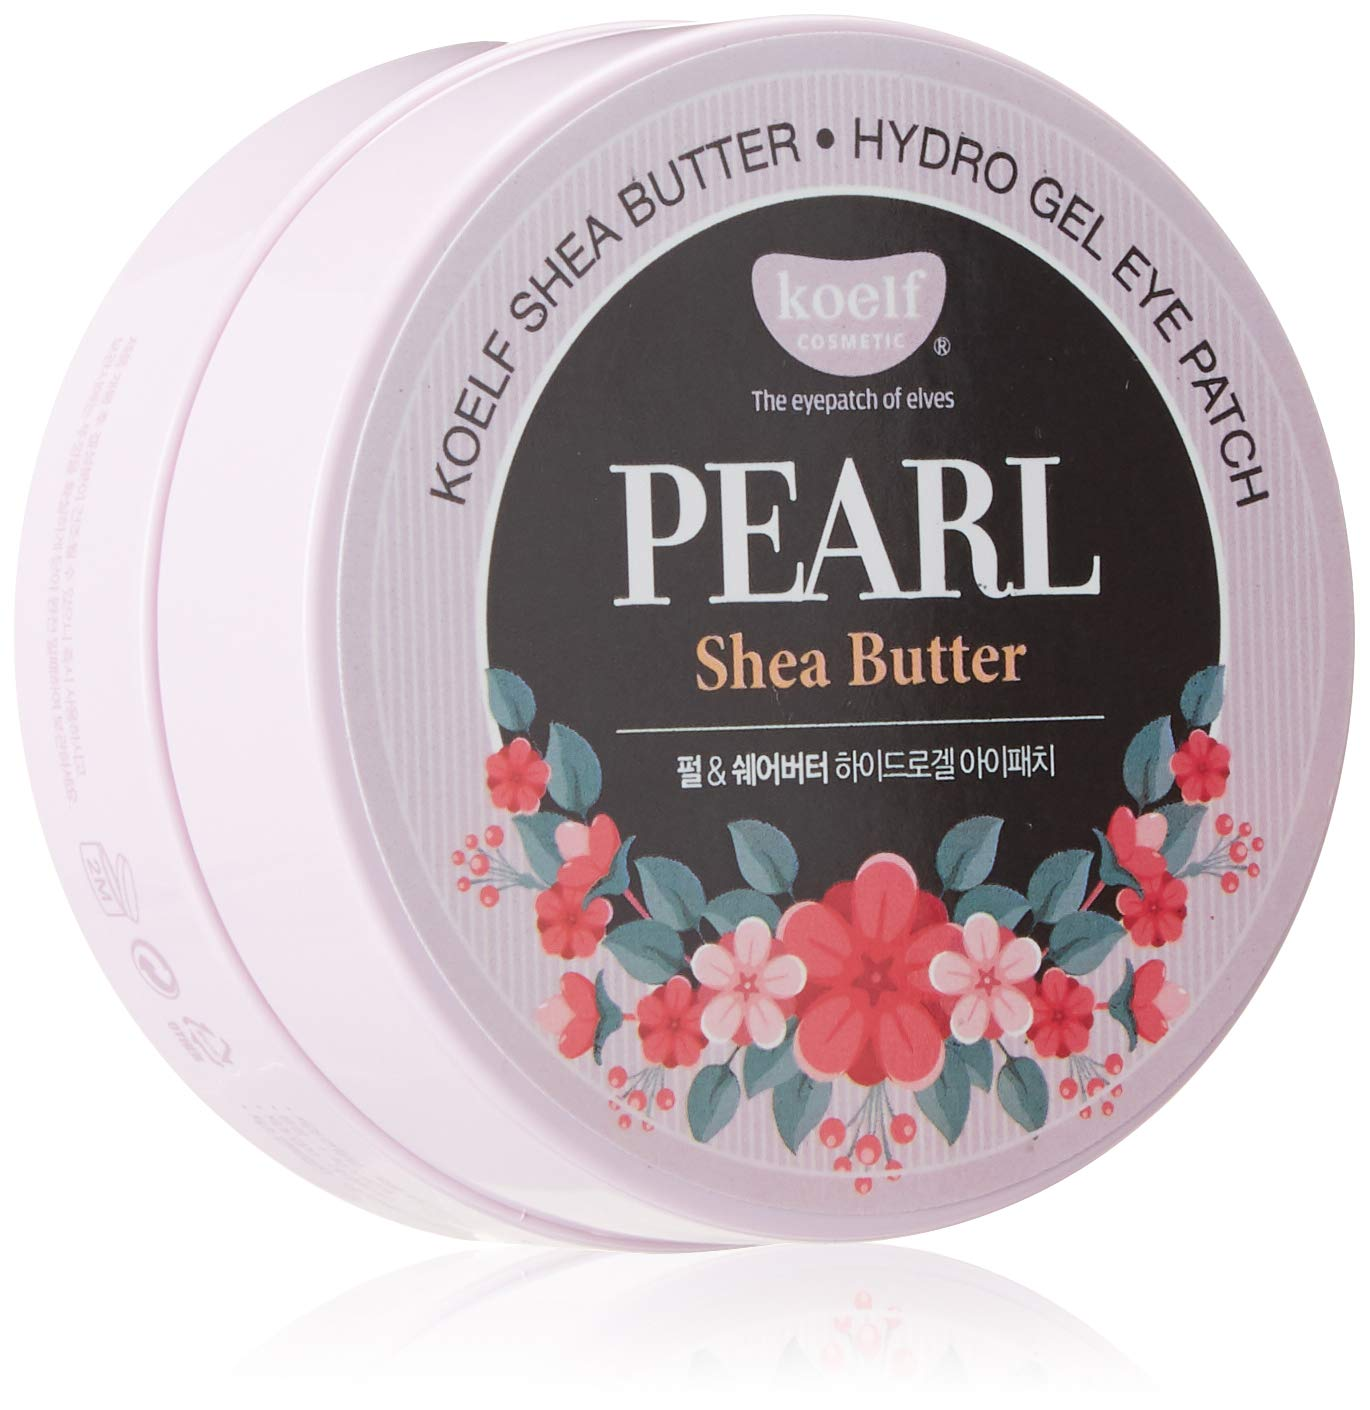 [Koelf] Pearl Shea Butter Eye Mask, 60 Sheets